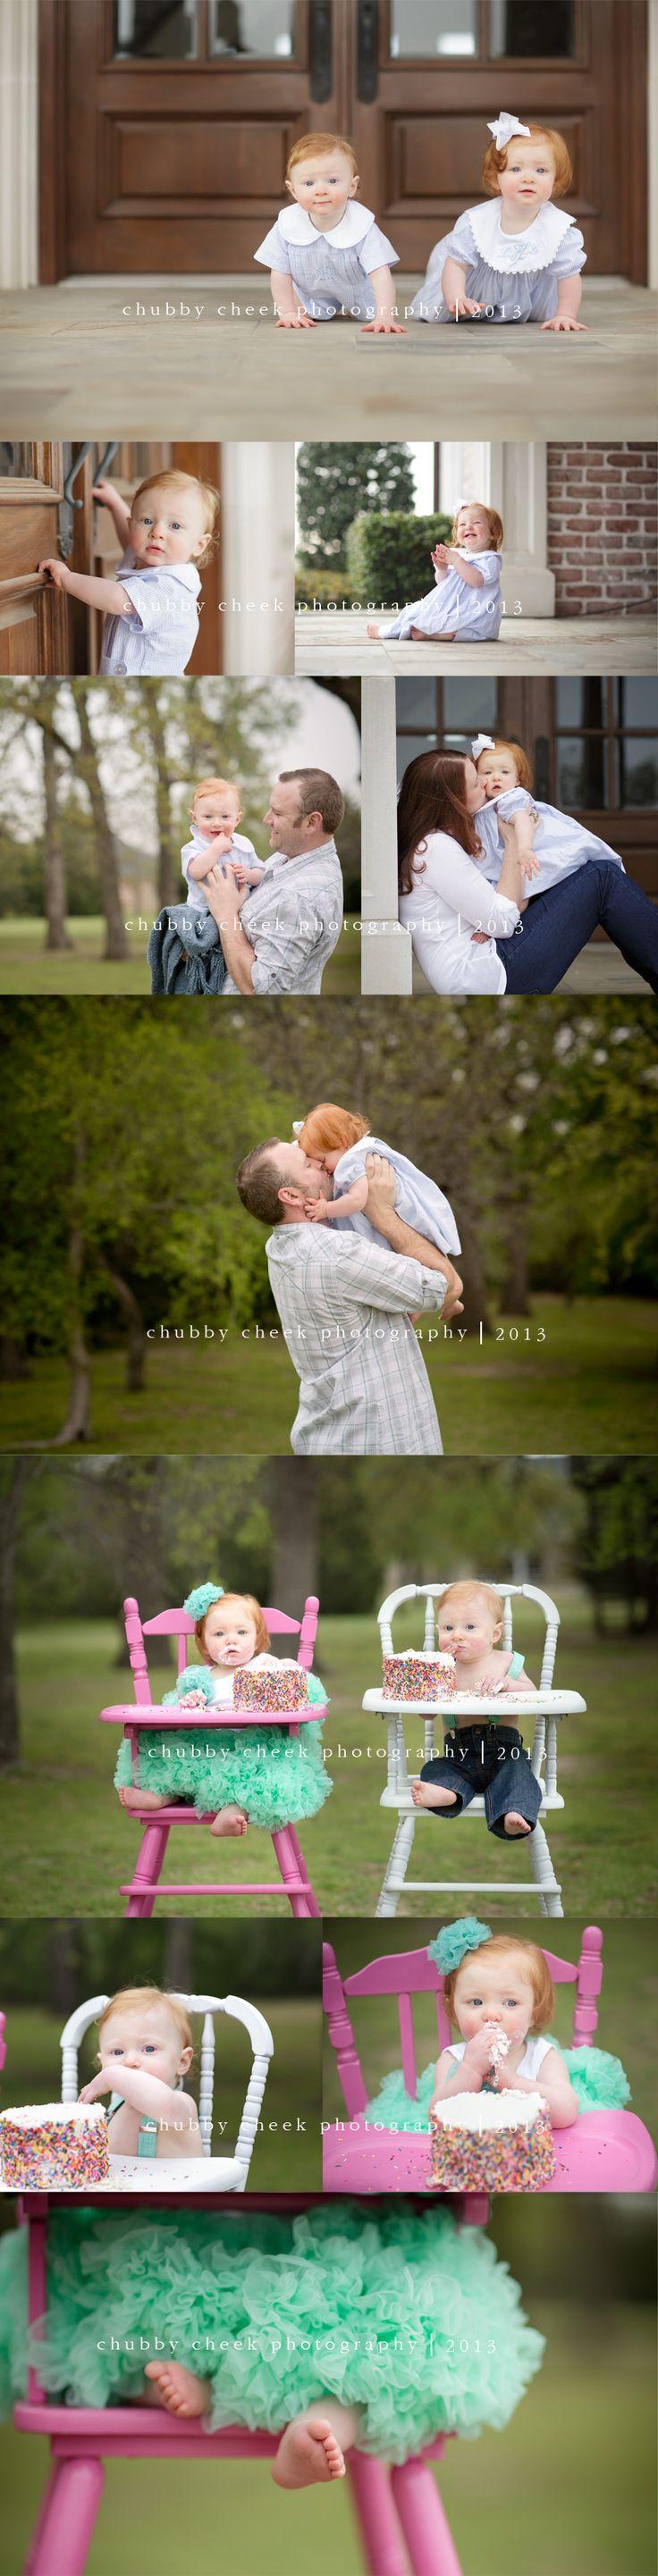 squeeeeeeaaaaallll… tomball tx child photographer   Chubby Cheek Photography Houston, TX Natural Light Photographer